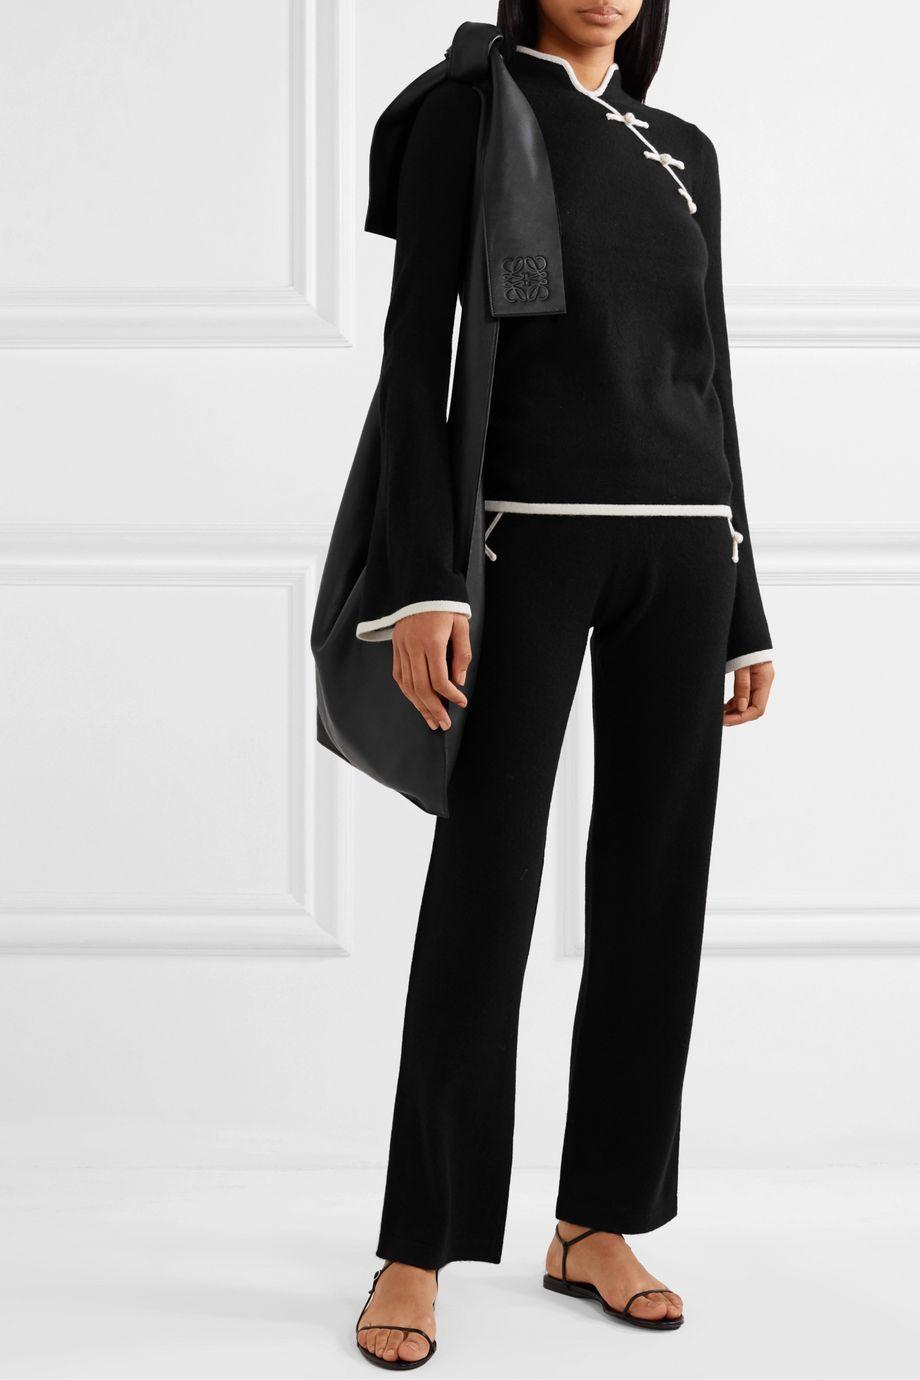 Madeleine Thompson Nave two-tone cashmere straight-leg track pants